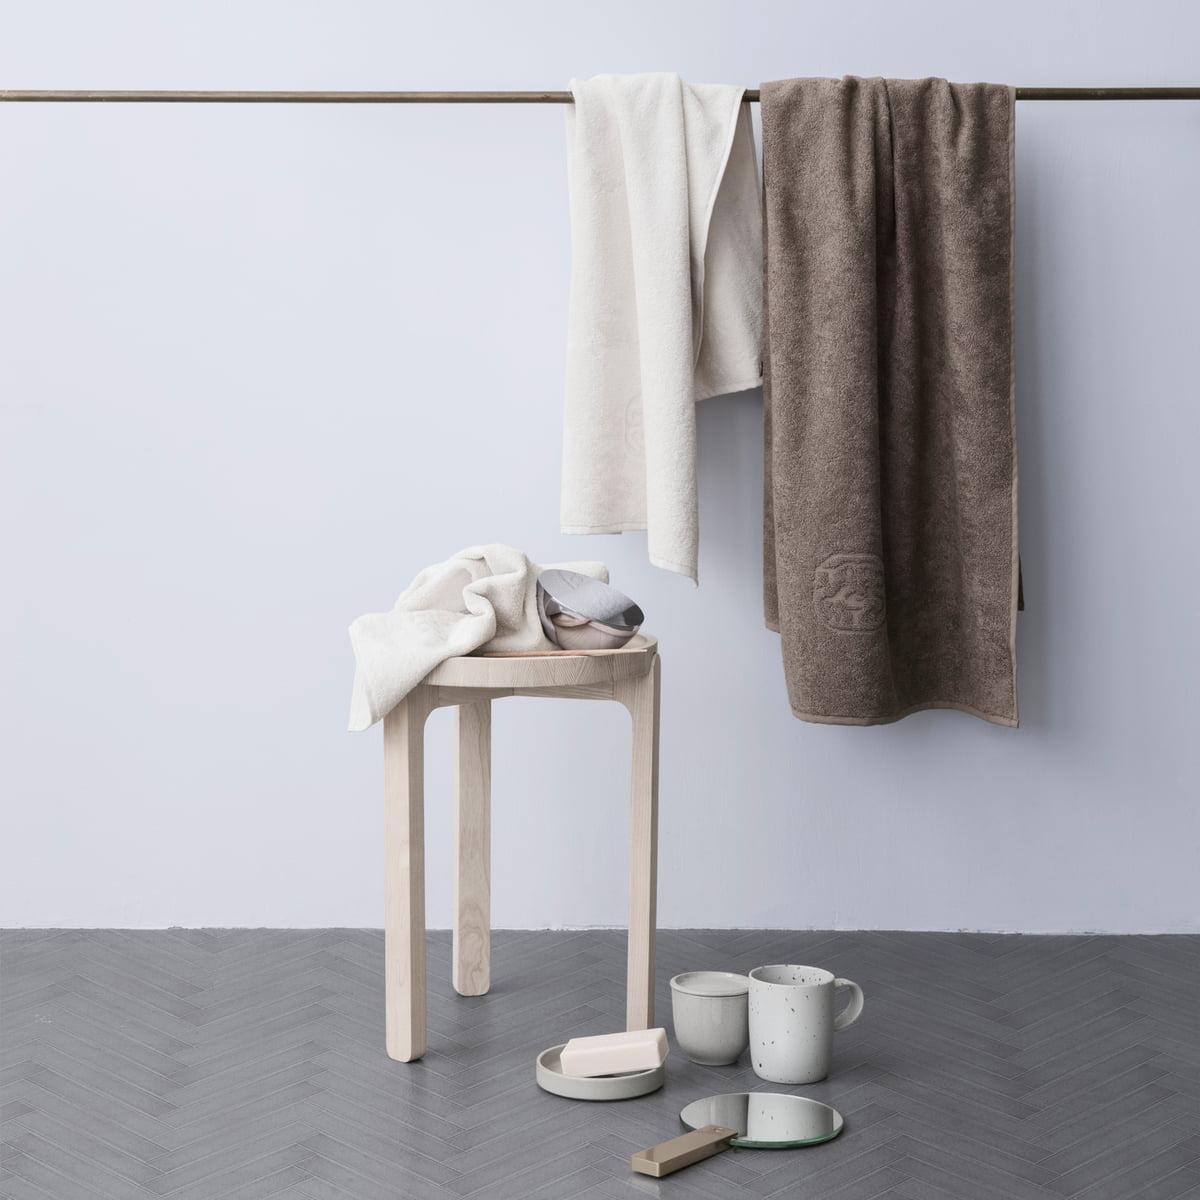 damask terry badetuch von georg jensen damask. Black Bedroom Furniture Sets. Home Design Ideas